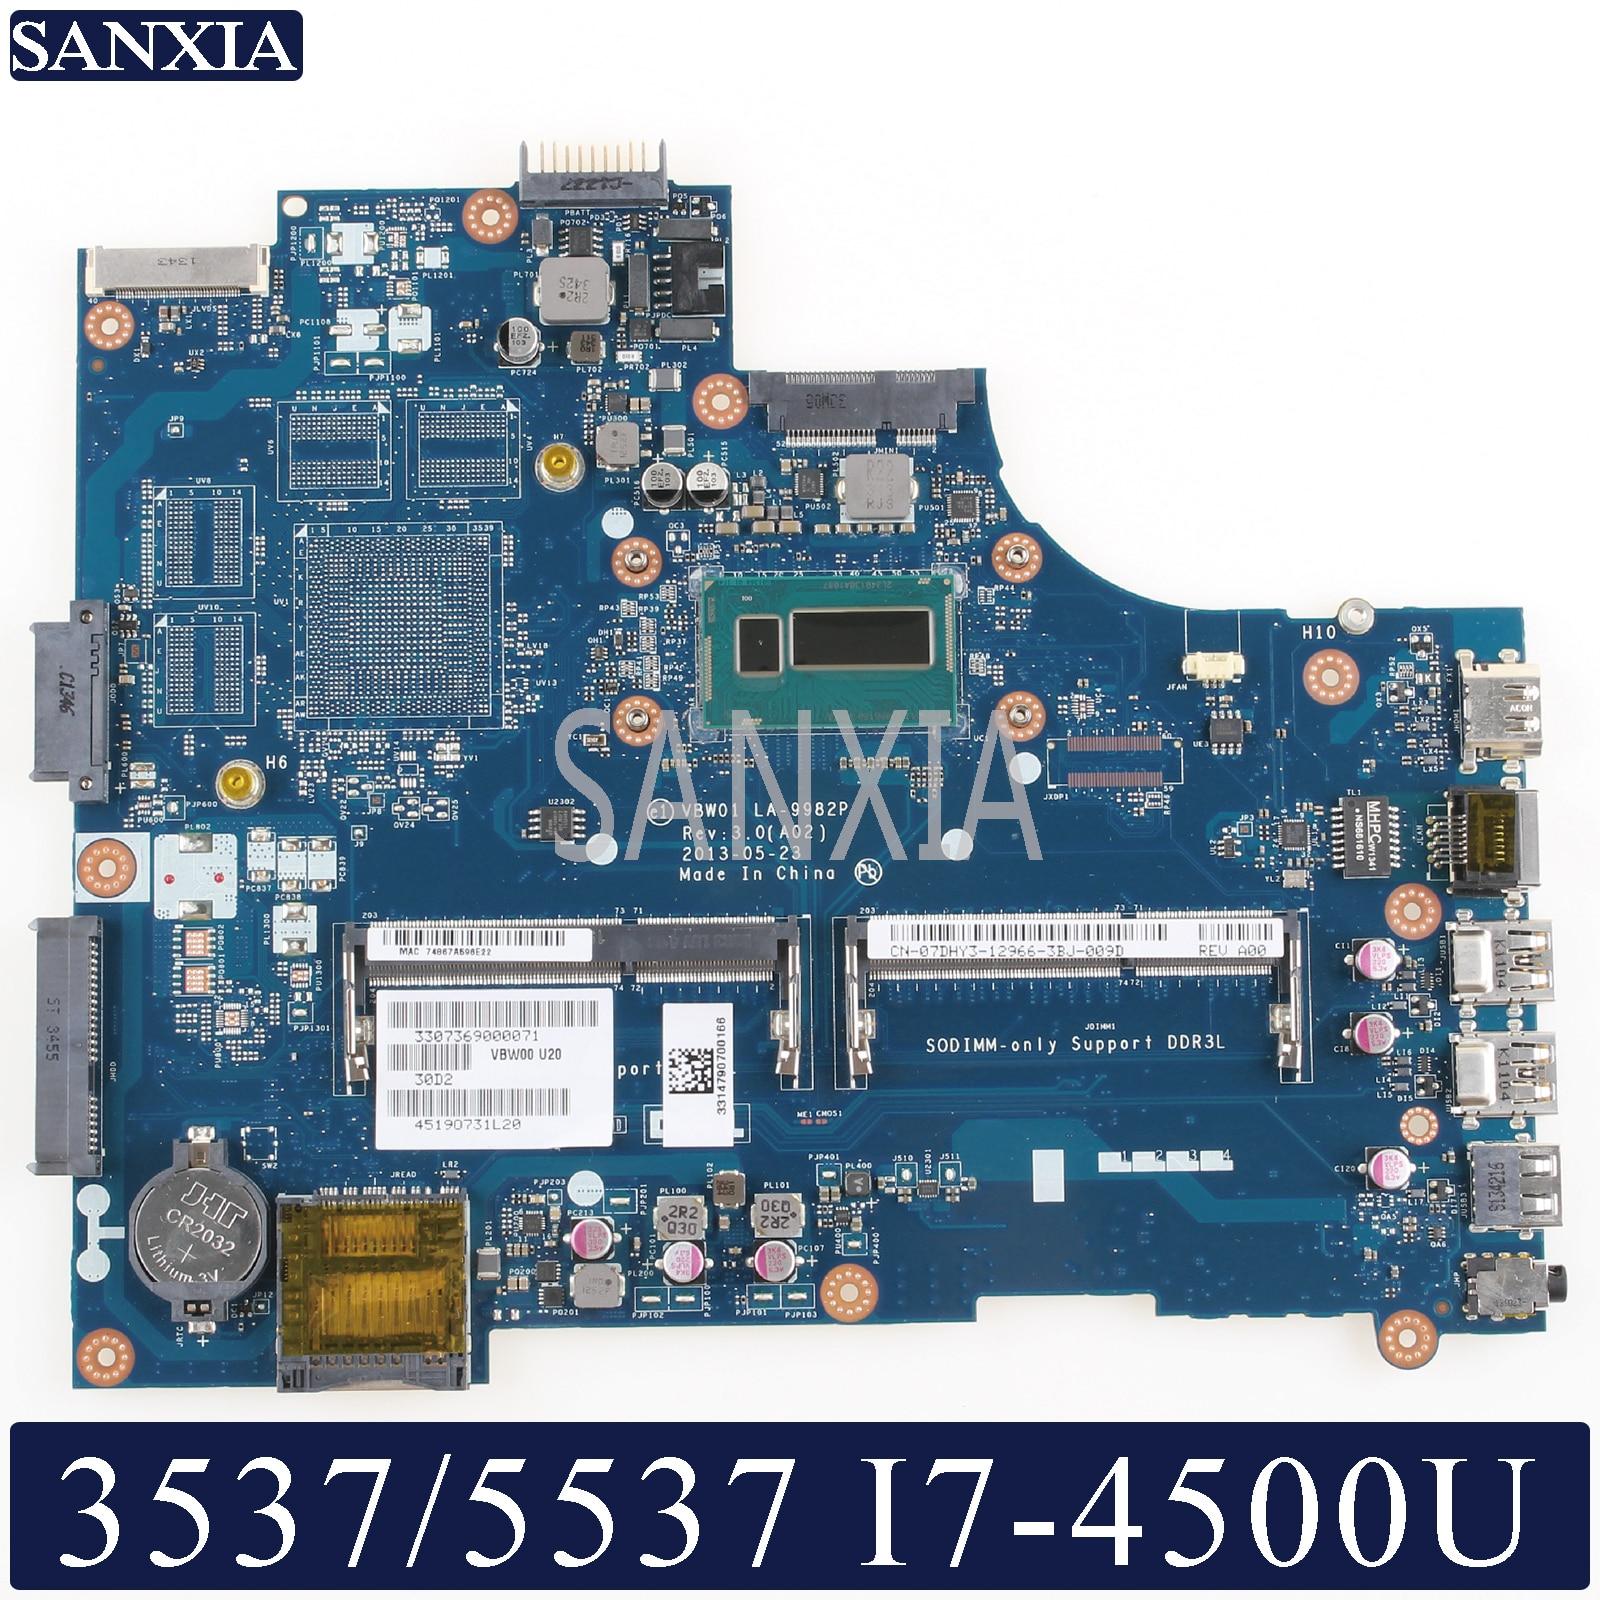 KEFU LA-9982P Laptop motherboard for Dell Inspiron 15R 5537 3537 original mainboard I7-4500U CPU GM